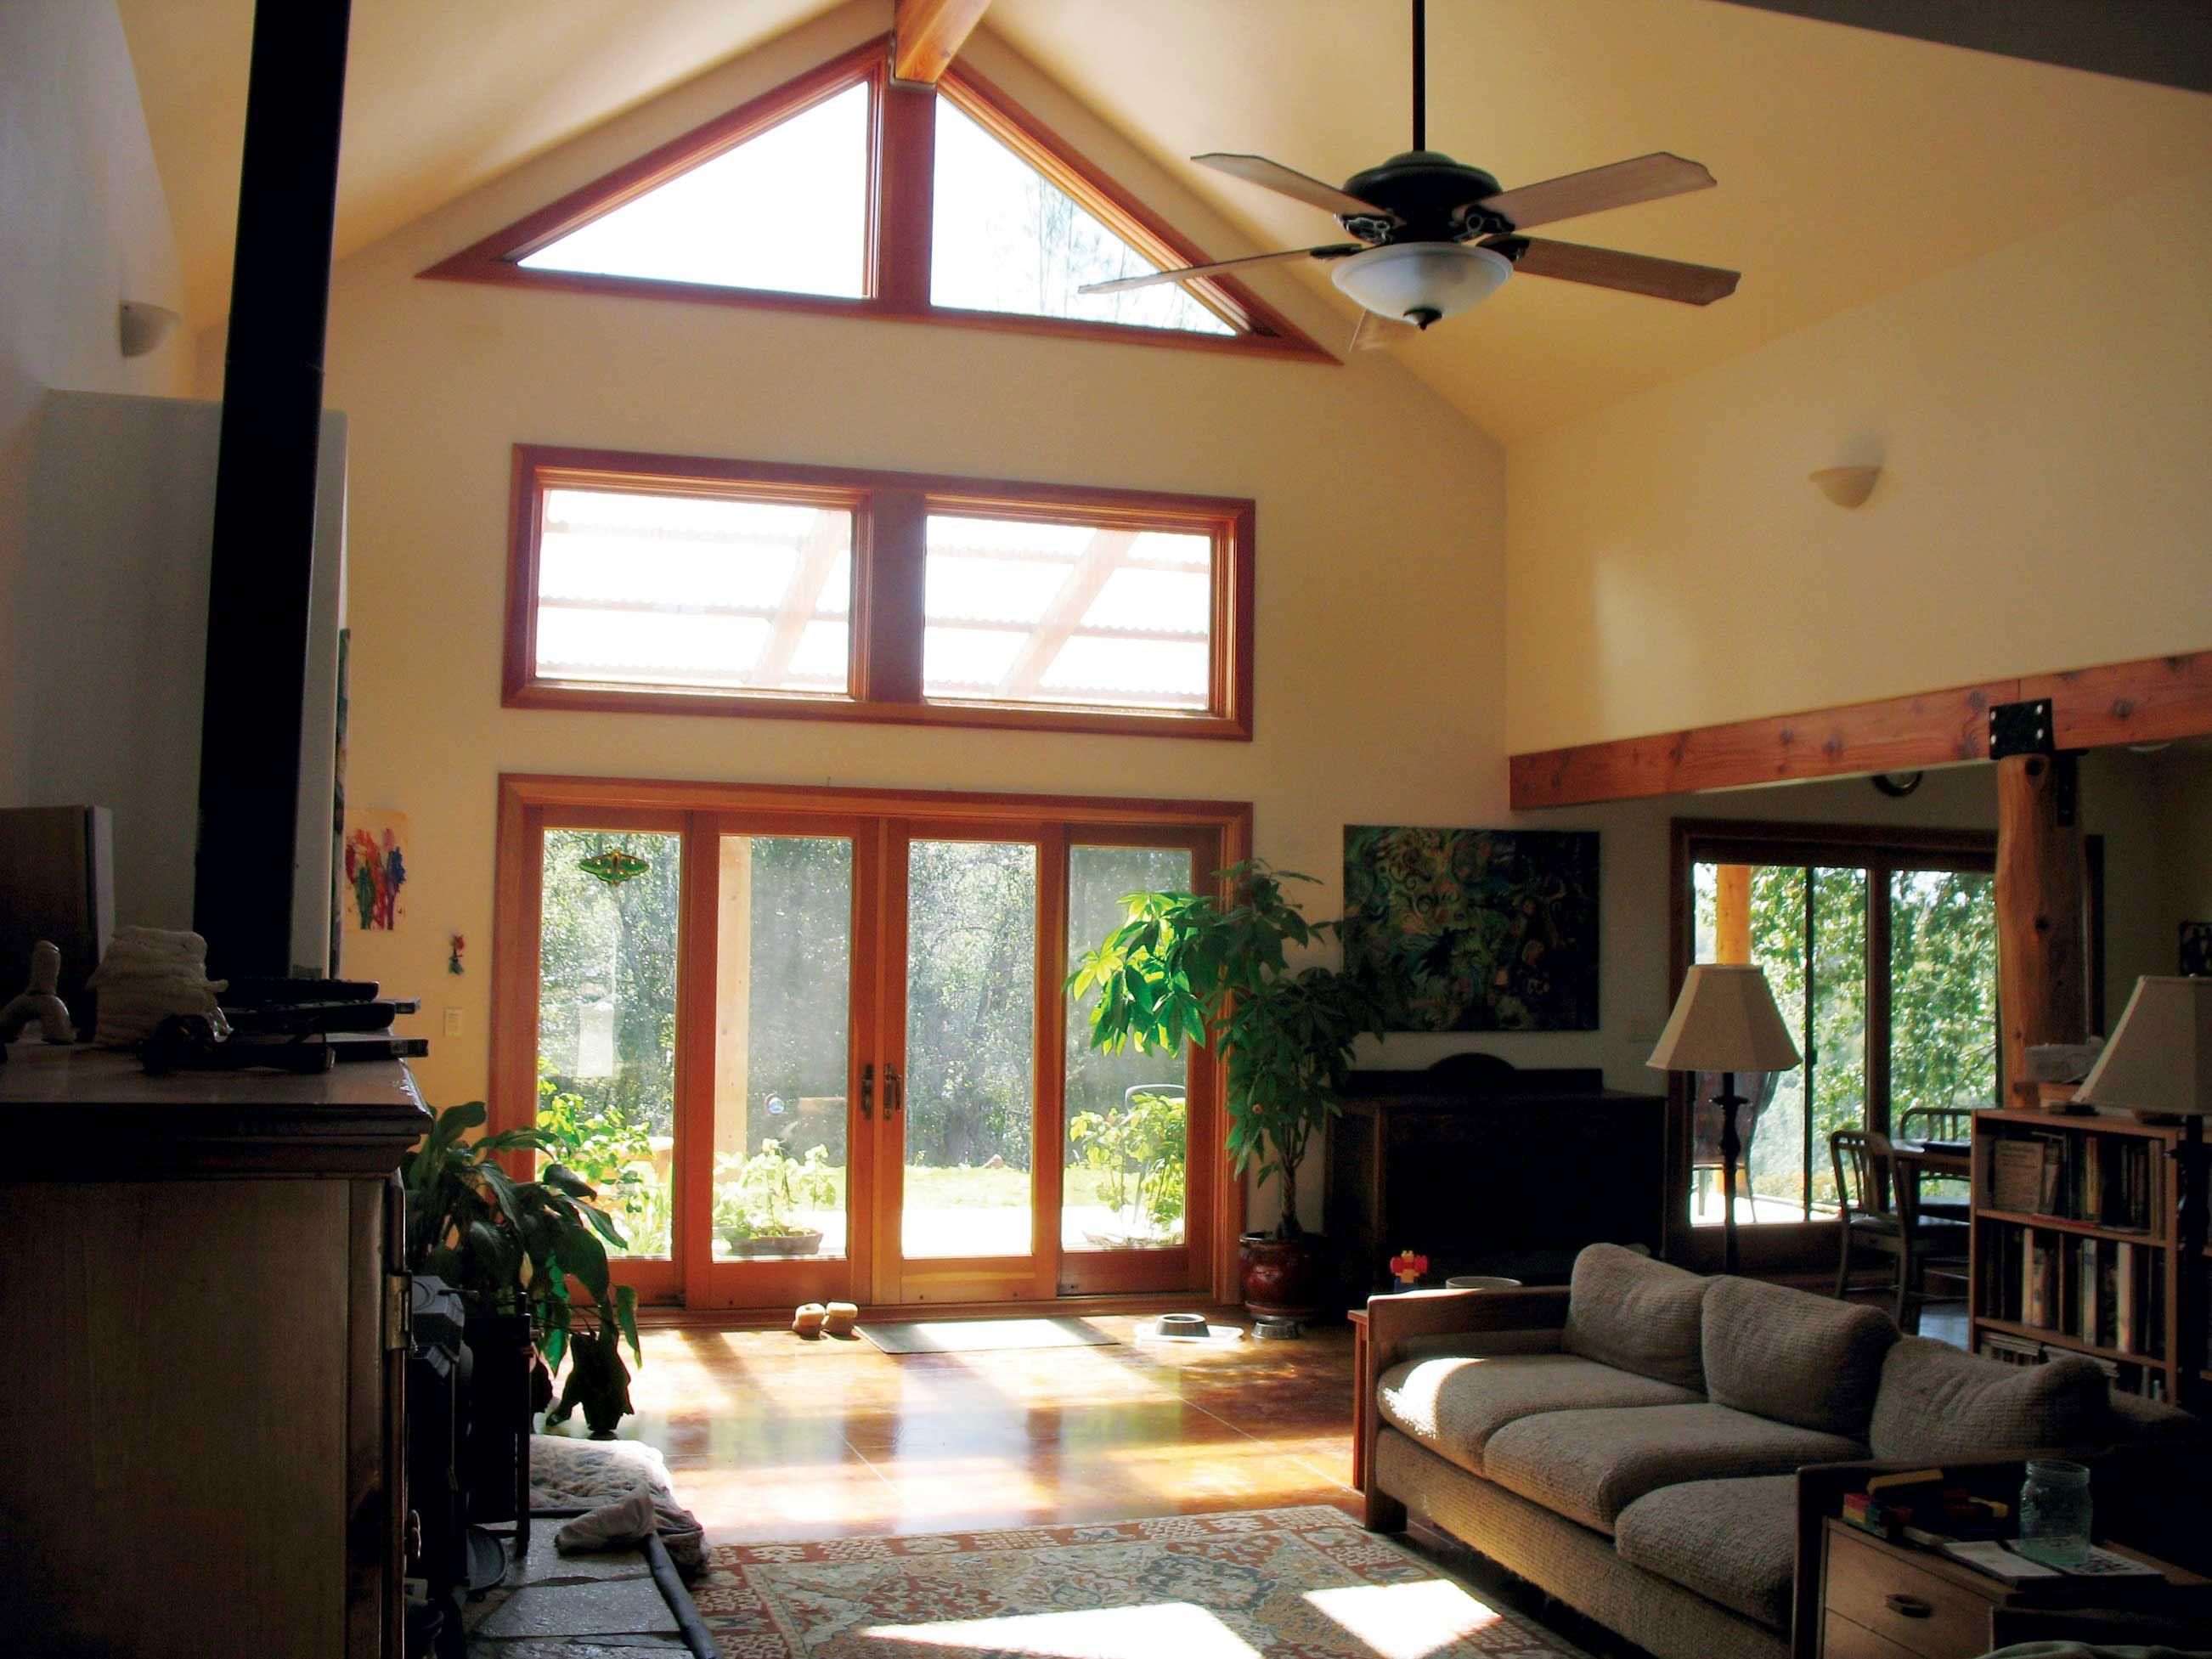 Home Design Basics Part - 42: Passive Solar Design Basics - Green Homes - MOTHER EARTH NEWS